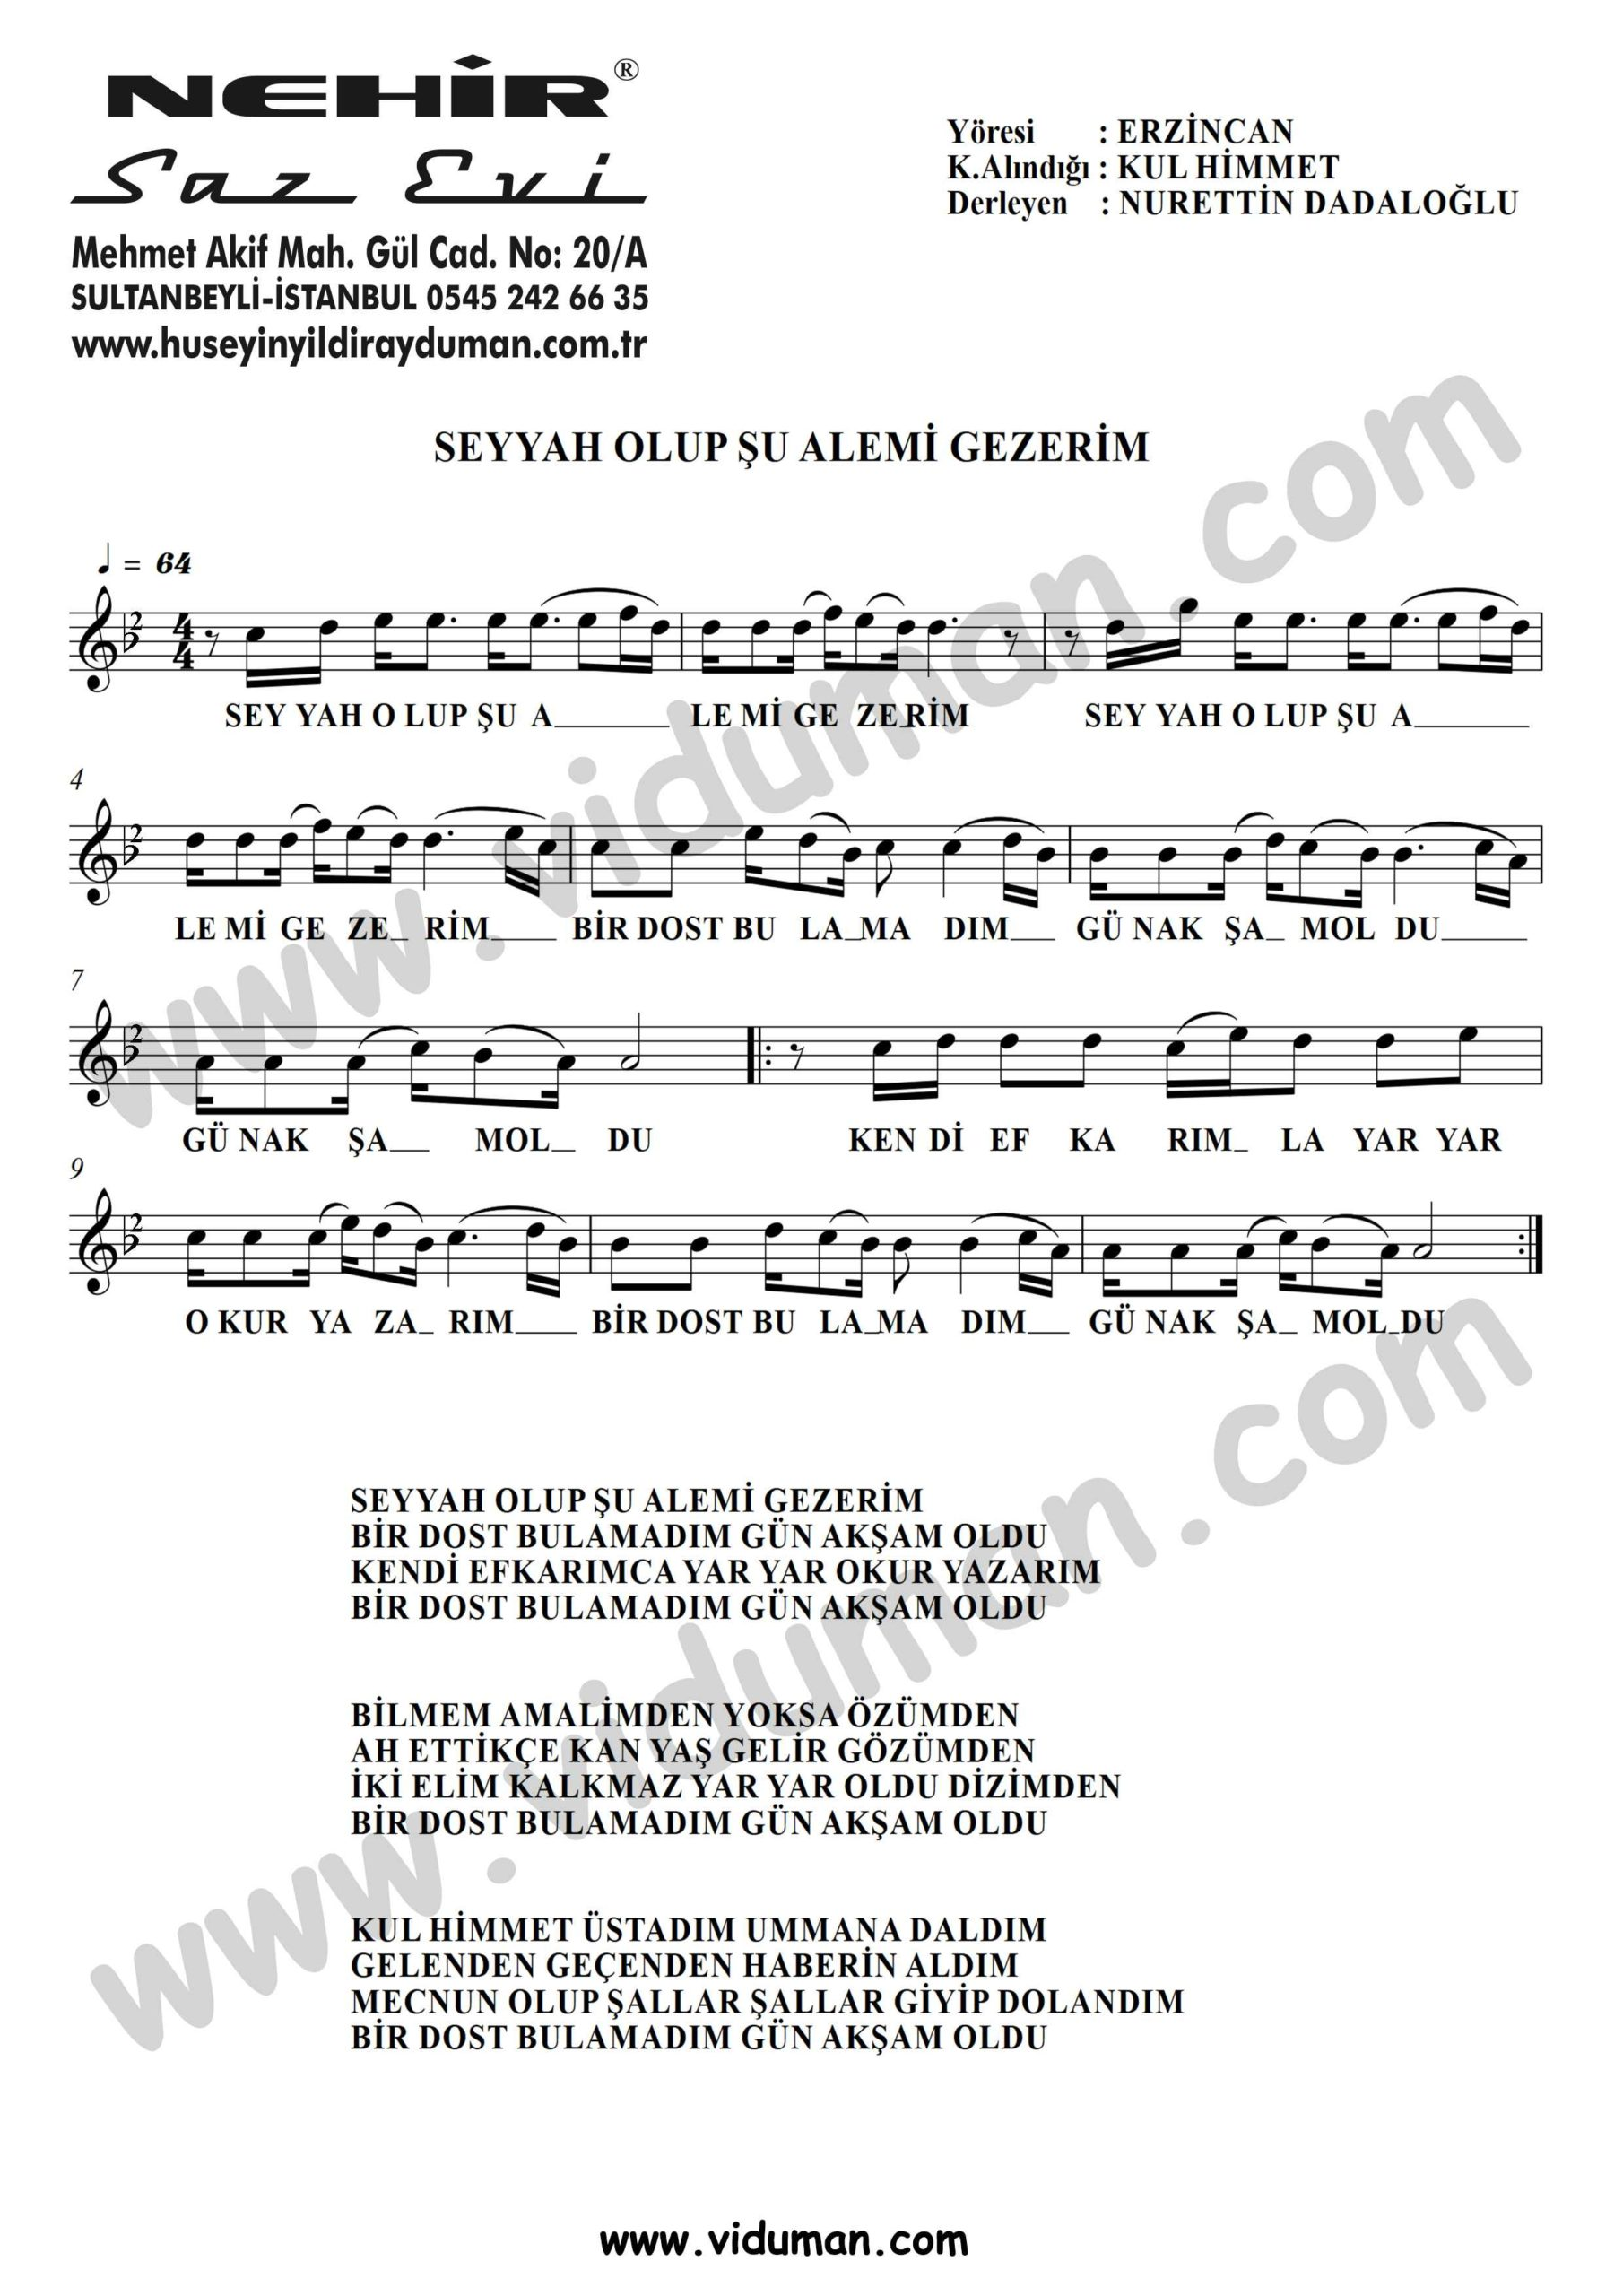 Seyyah Olup Su Alemi Gezerim-Baglama-Saz-Turku-Notalari